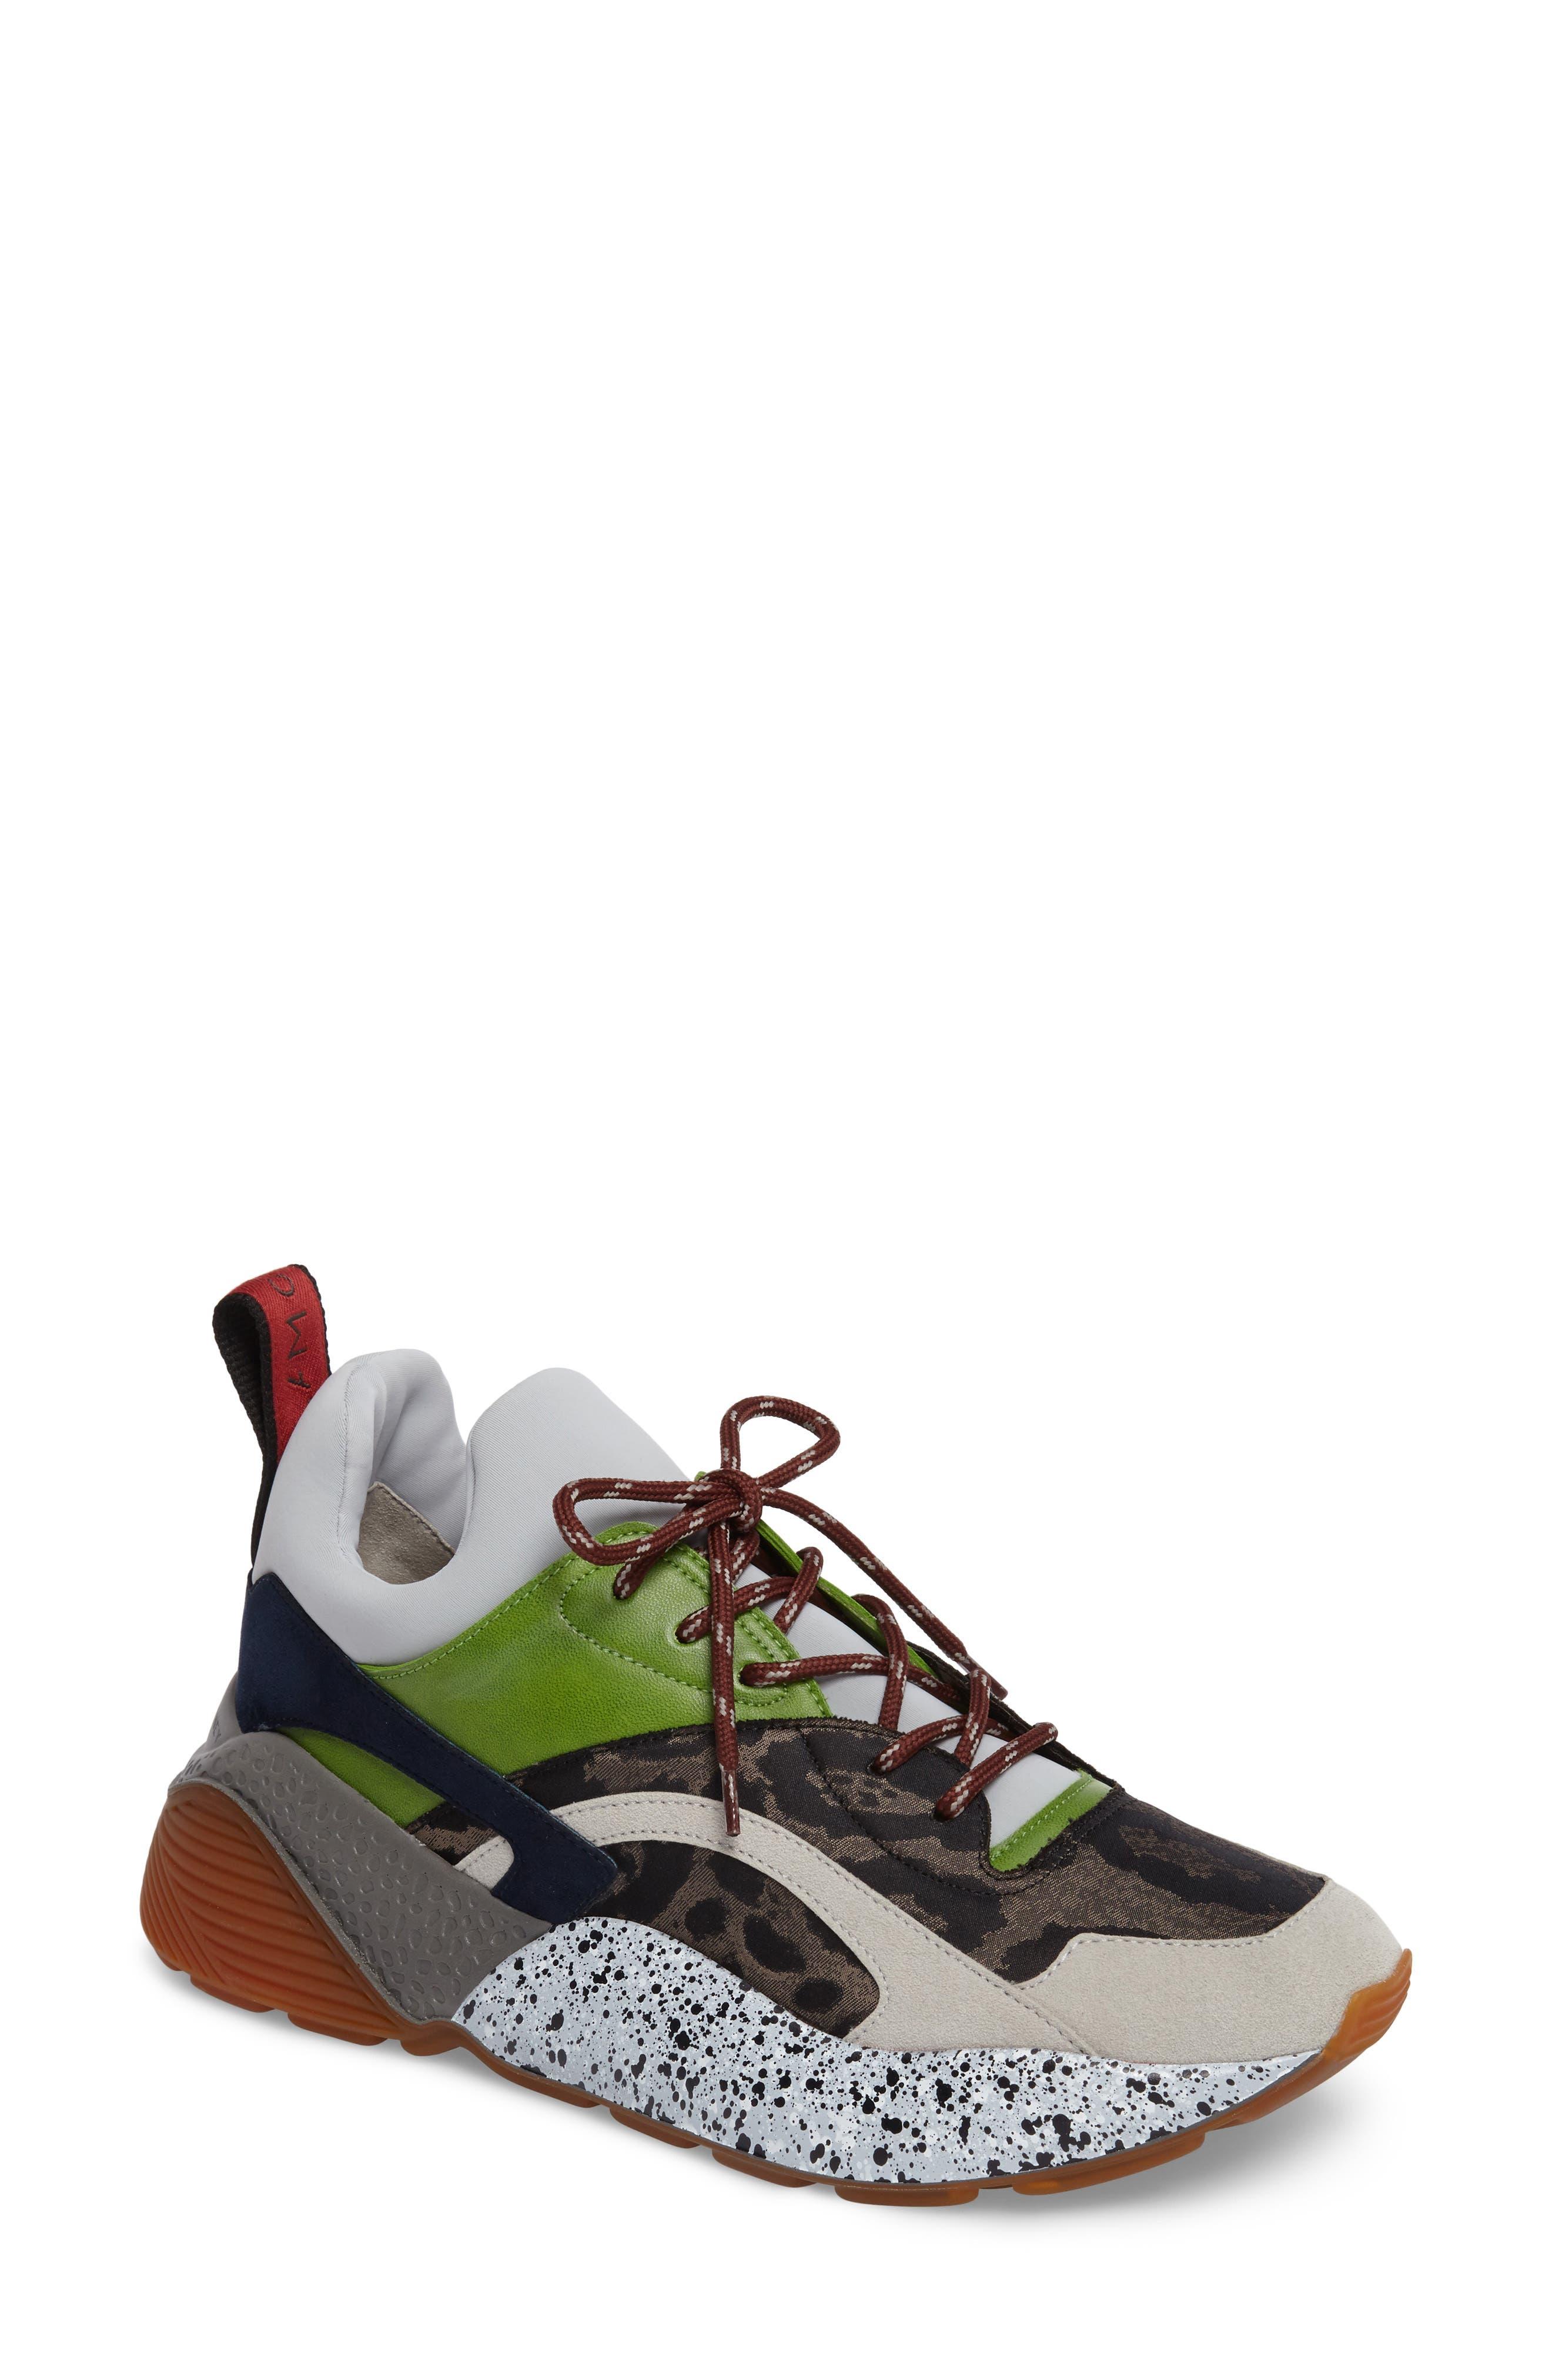 Eclypse Sneaker,                         Main,                         color, 020